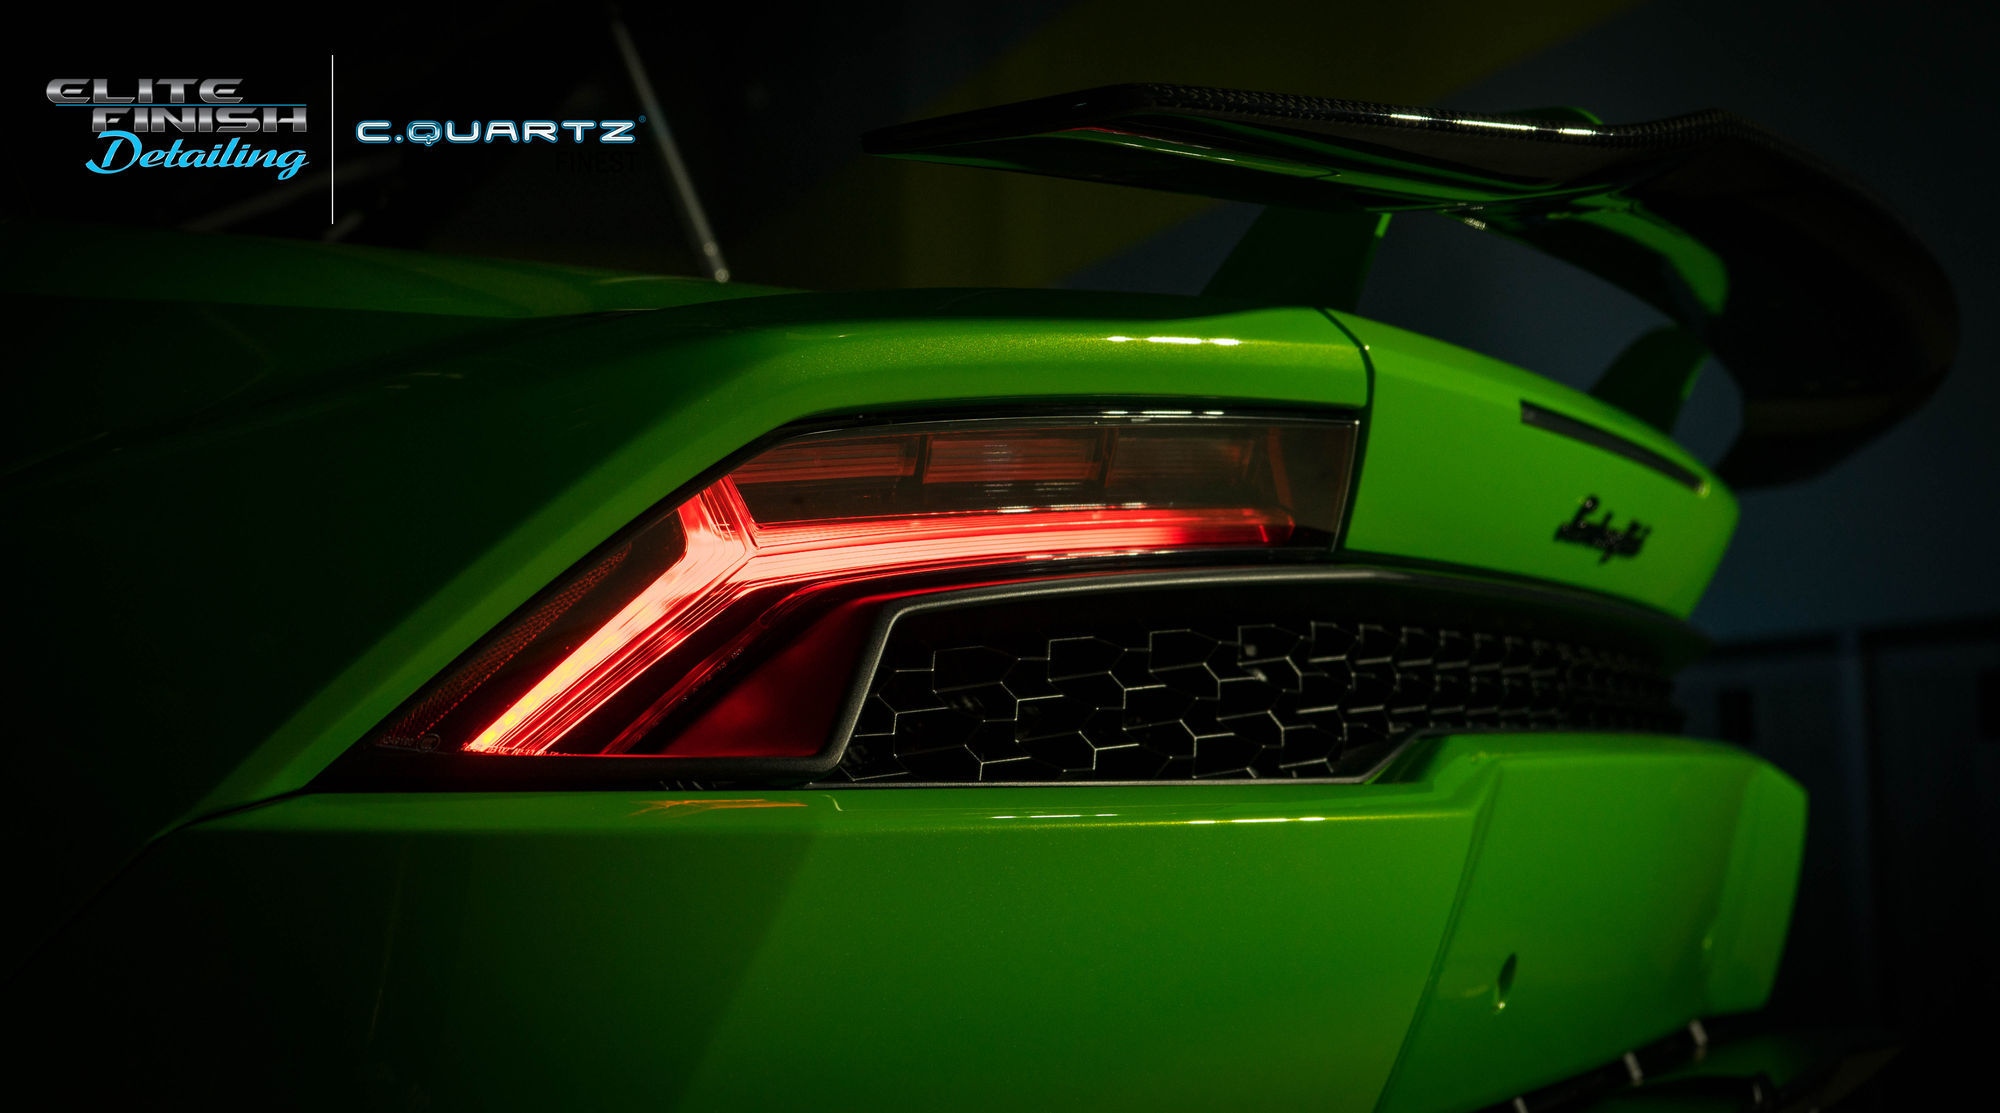 2015 Lamborghini Huracan   Lamborghini Huracan built by Famous Autosports